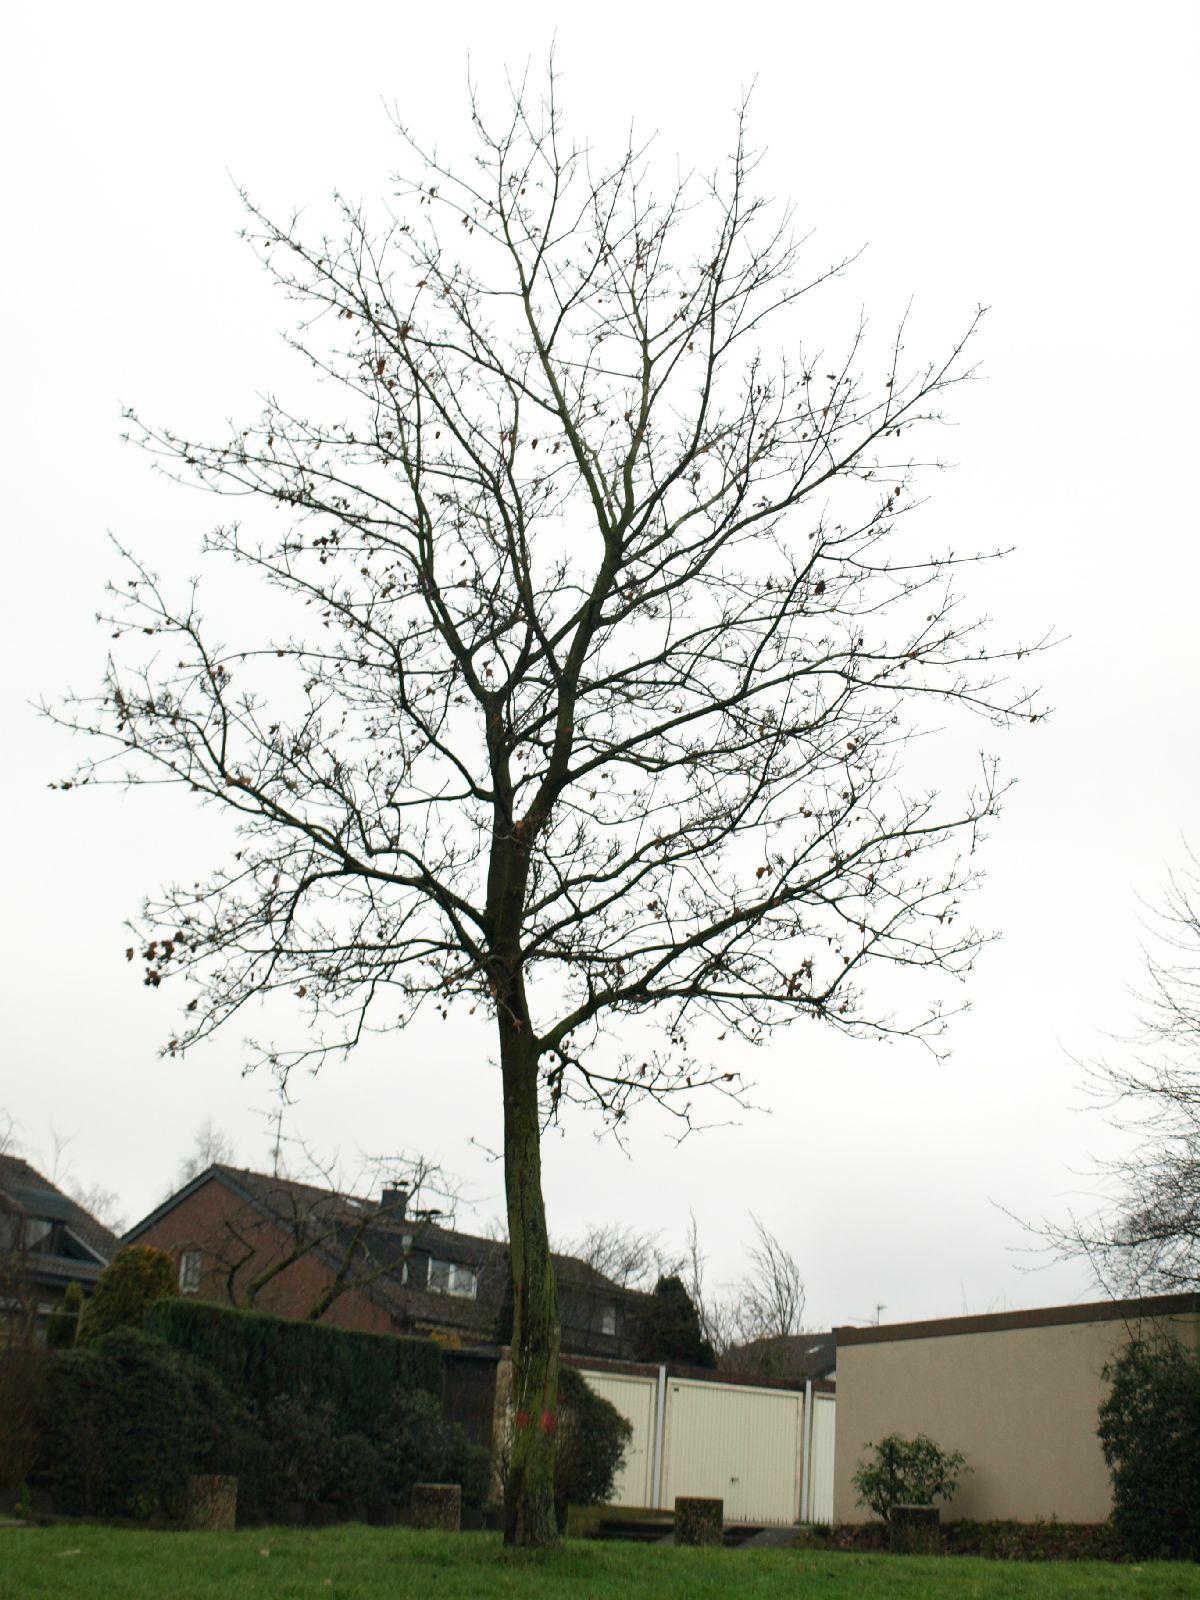 Pflanzen-Baum-Silhouette-Foto_Textur_B_PC238092